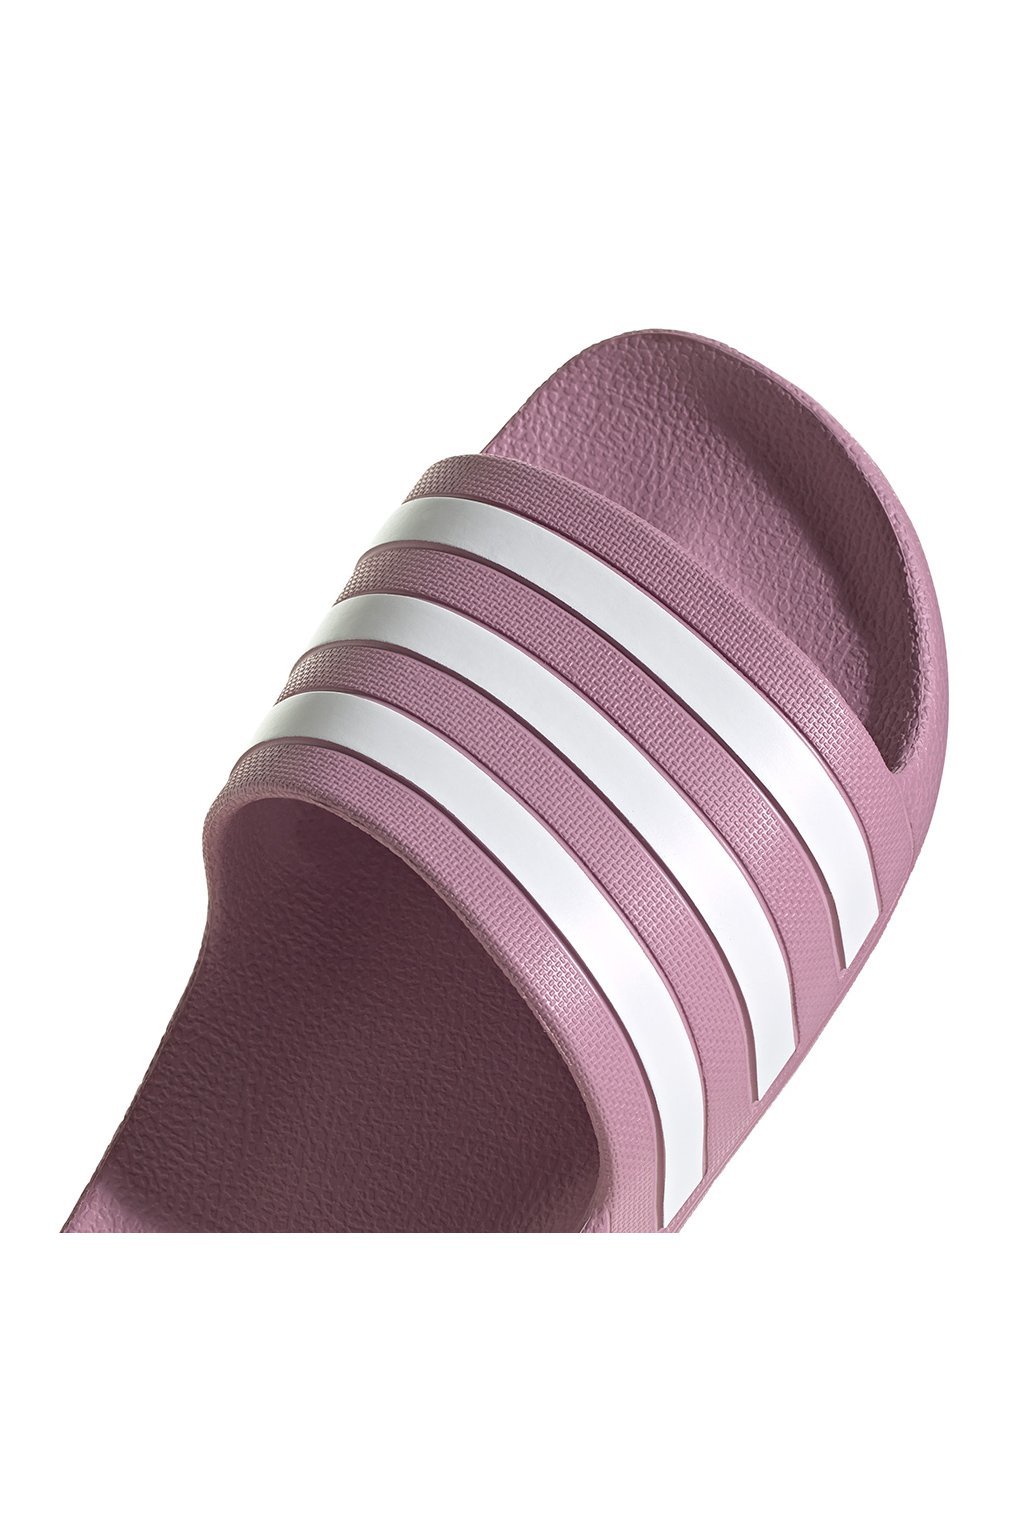 Dámske šľapky adidas Adilette Aqua FY8107 fialové